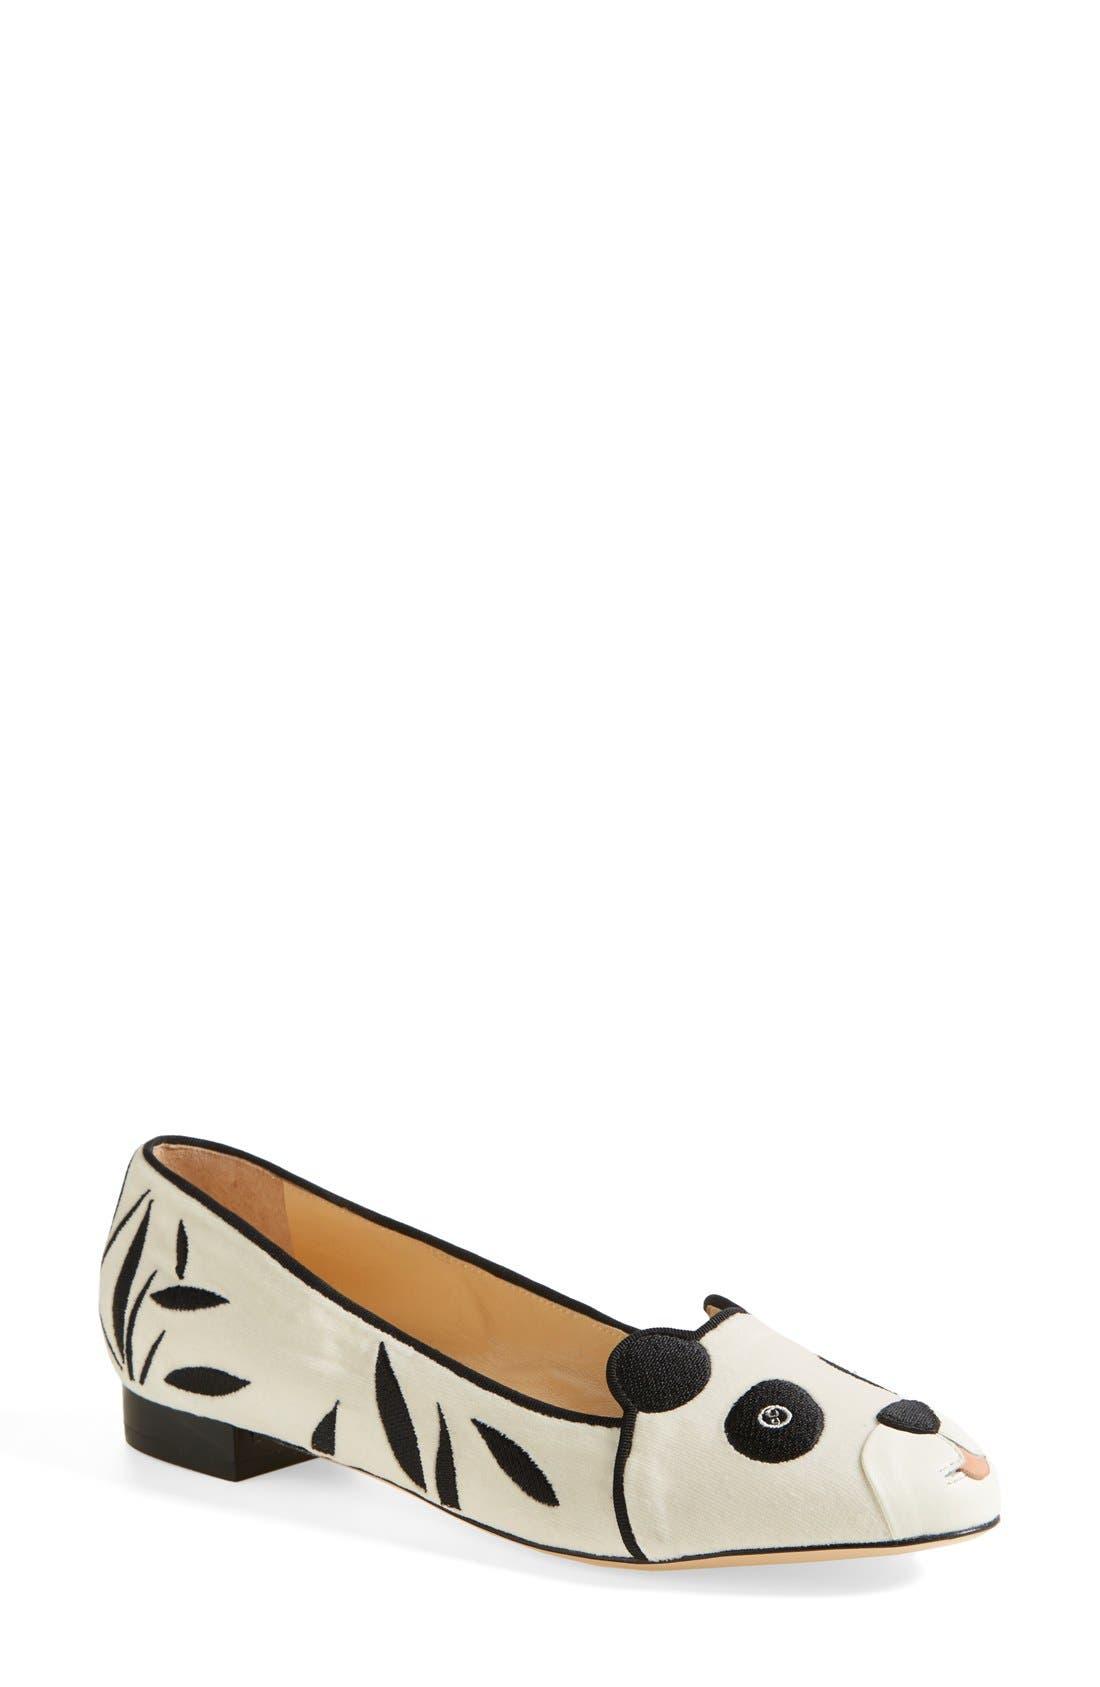 Main Image - Charlotte Olympia 'Panda' Silk Velvet & Calfskin Leather Flat (Women)